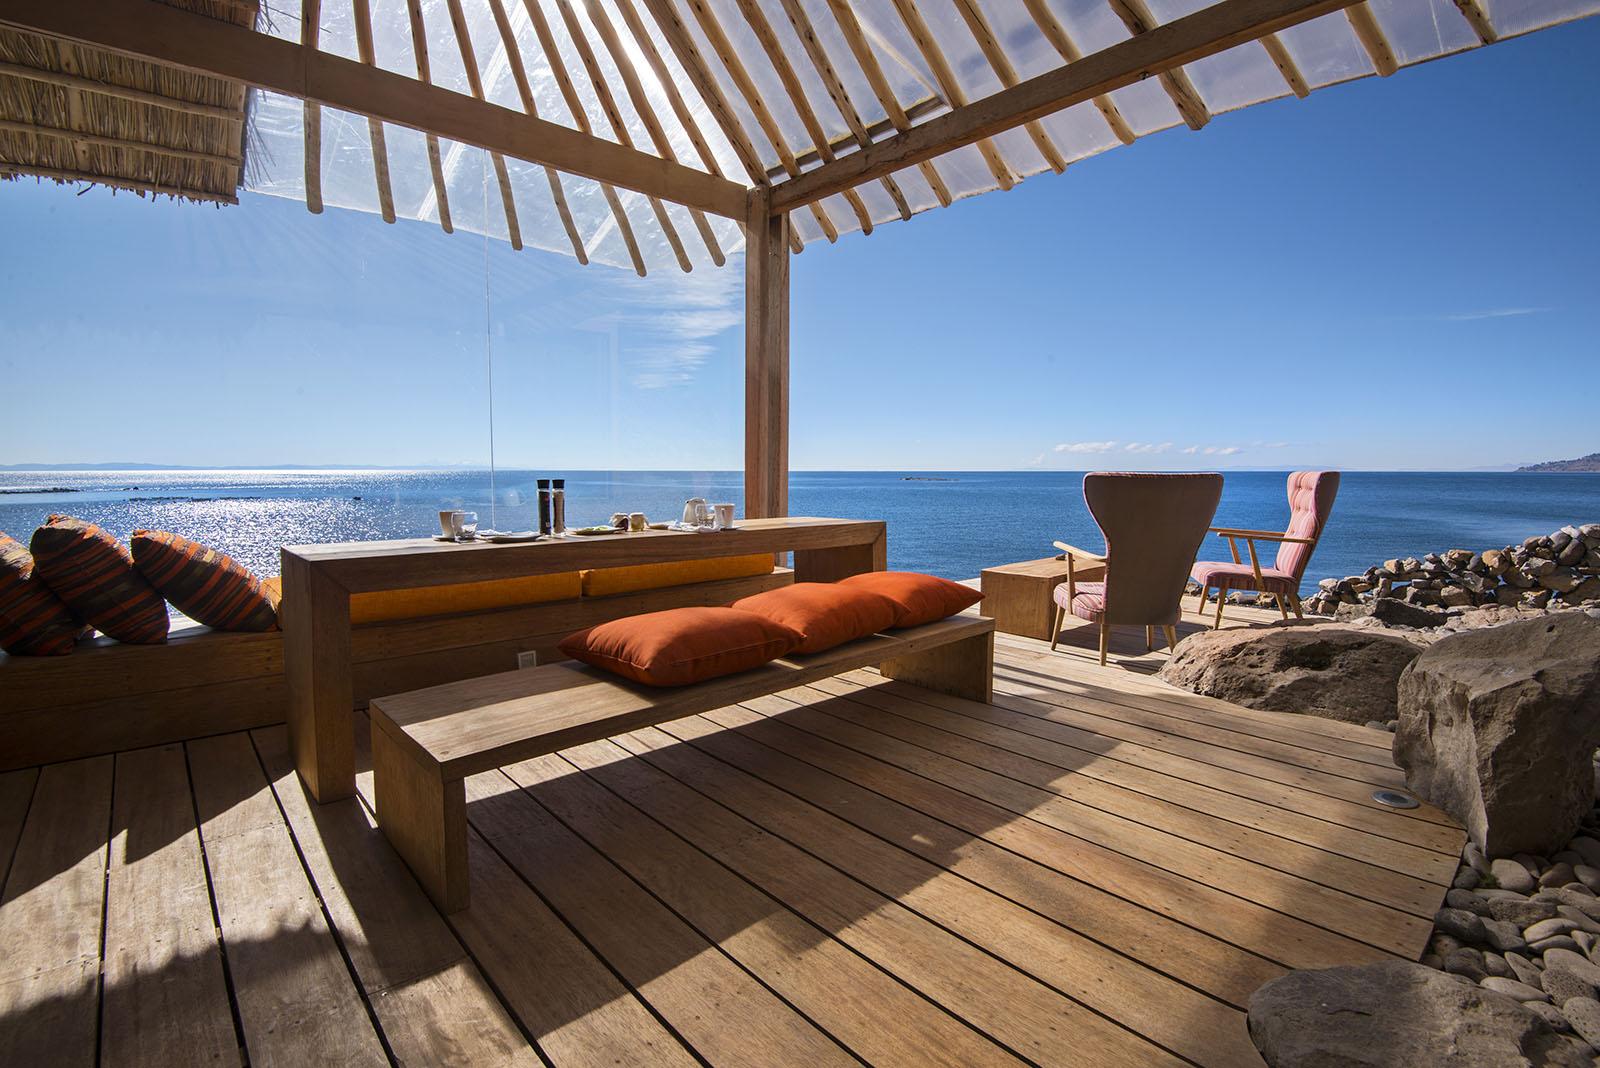 amantika-lodge-terrace-view